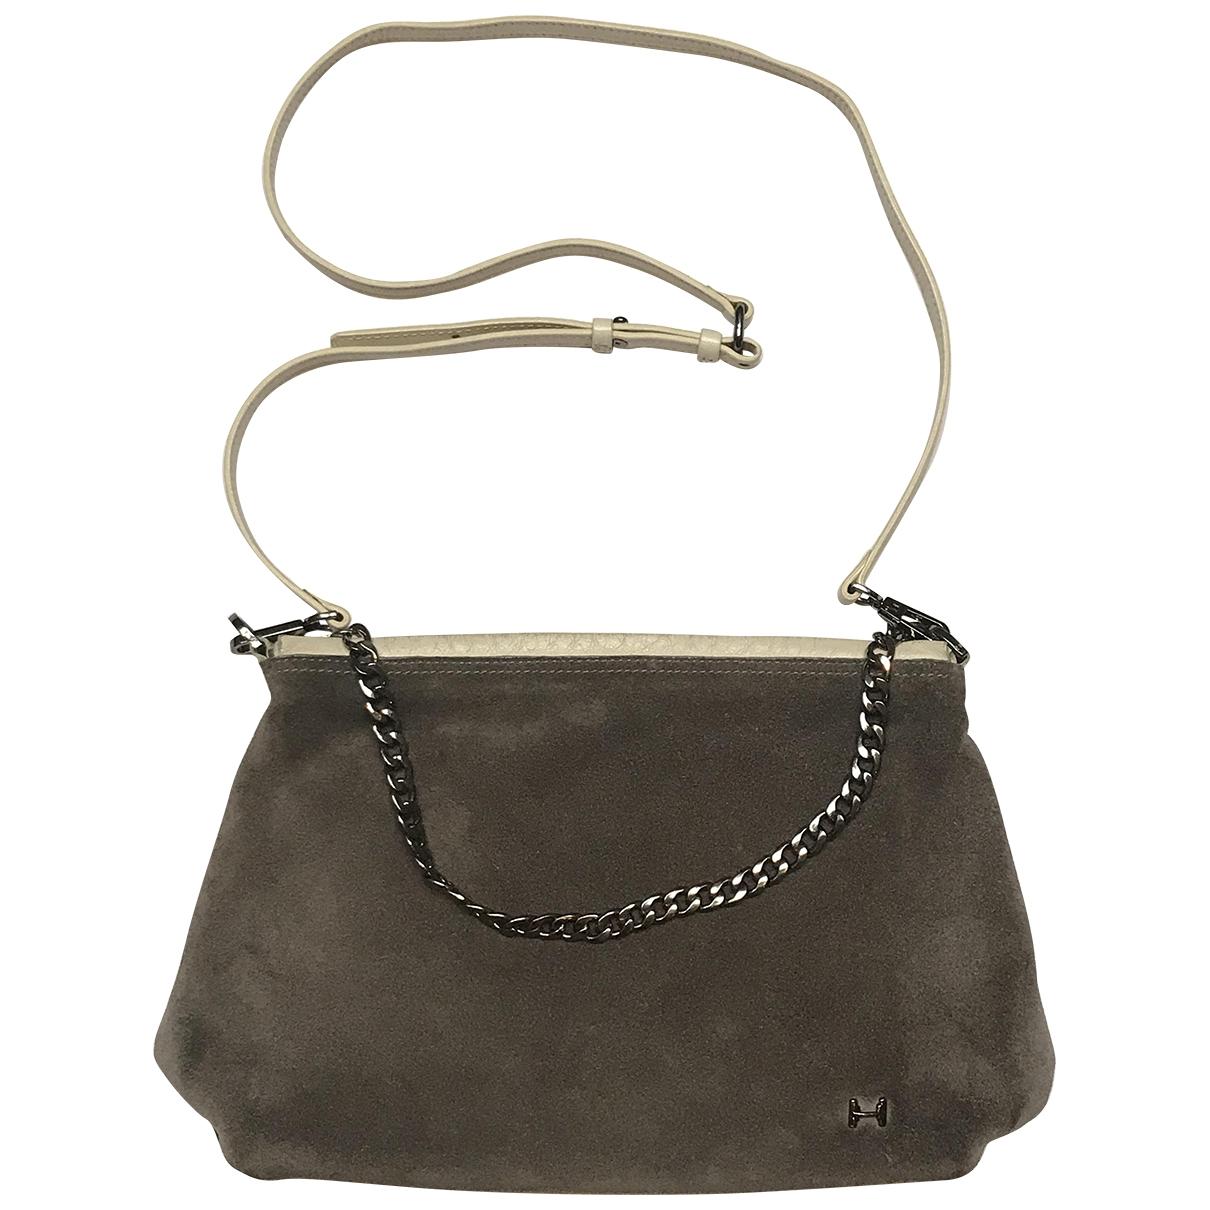 Halston Heritage \N Brown Leather handbag for Women \N